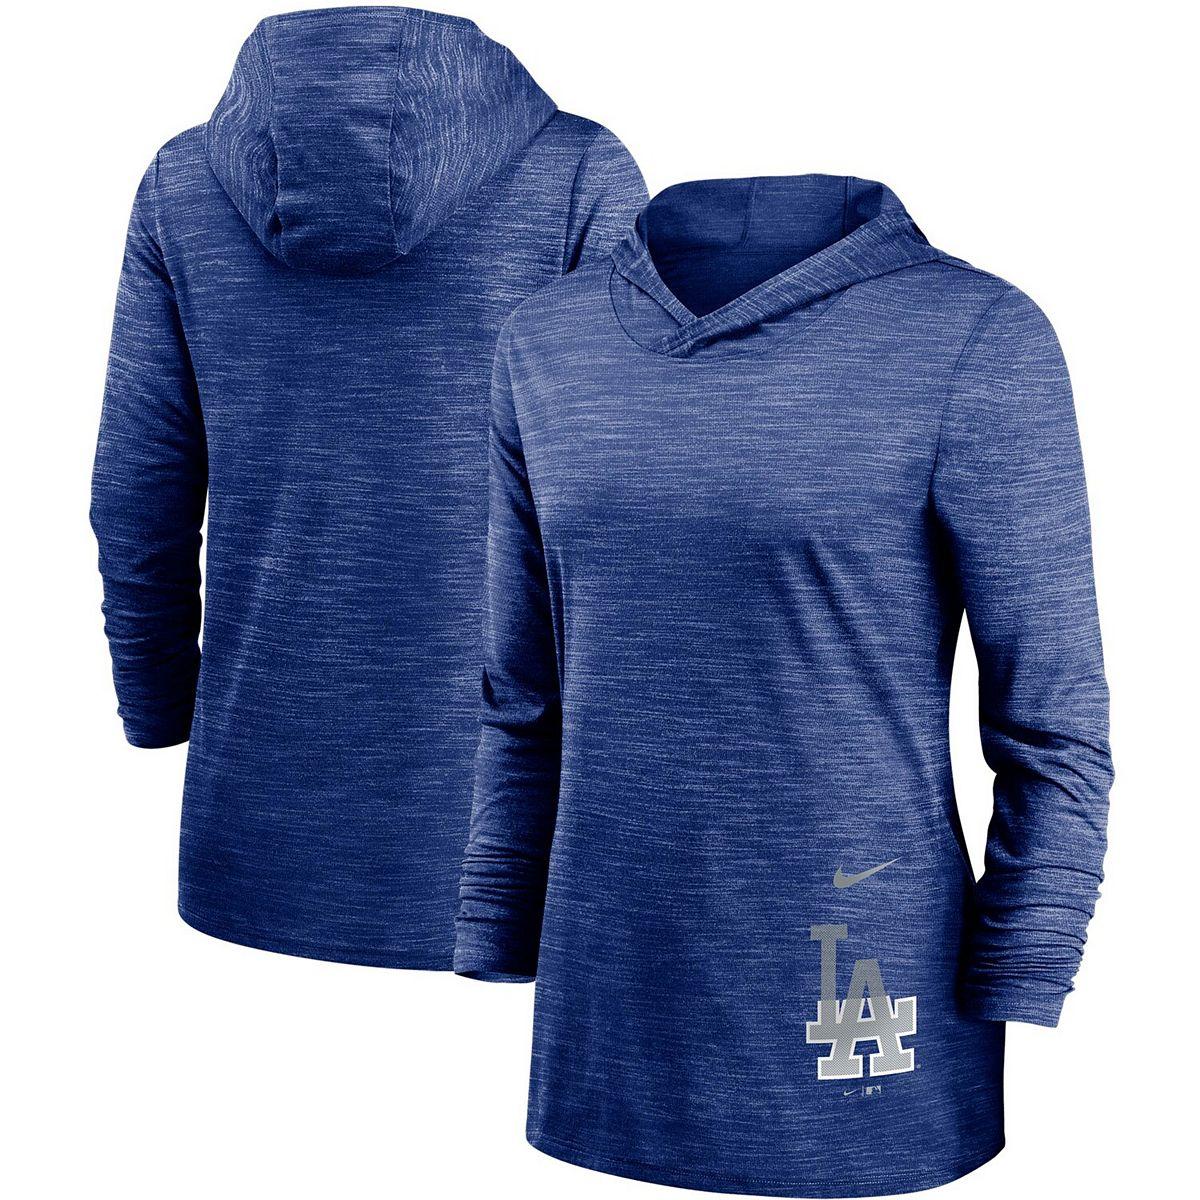 Women's Nike Heathered Royal Los Angeles Dodgers Split Logo Legend Hoodie Training Performance Top m7gsV